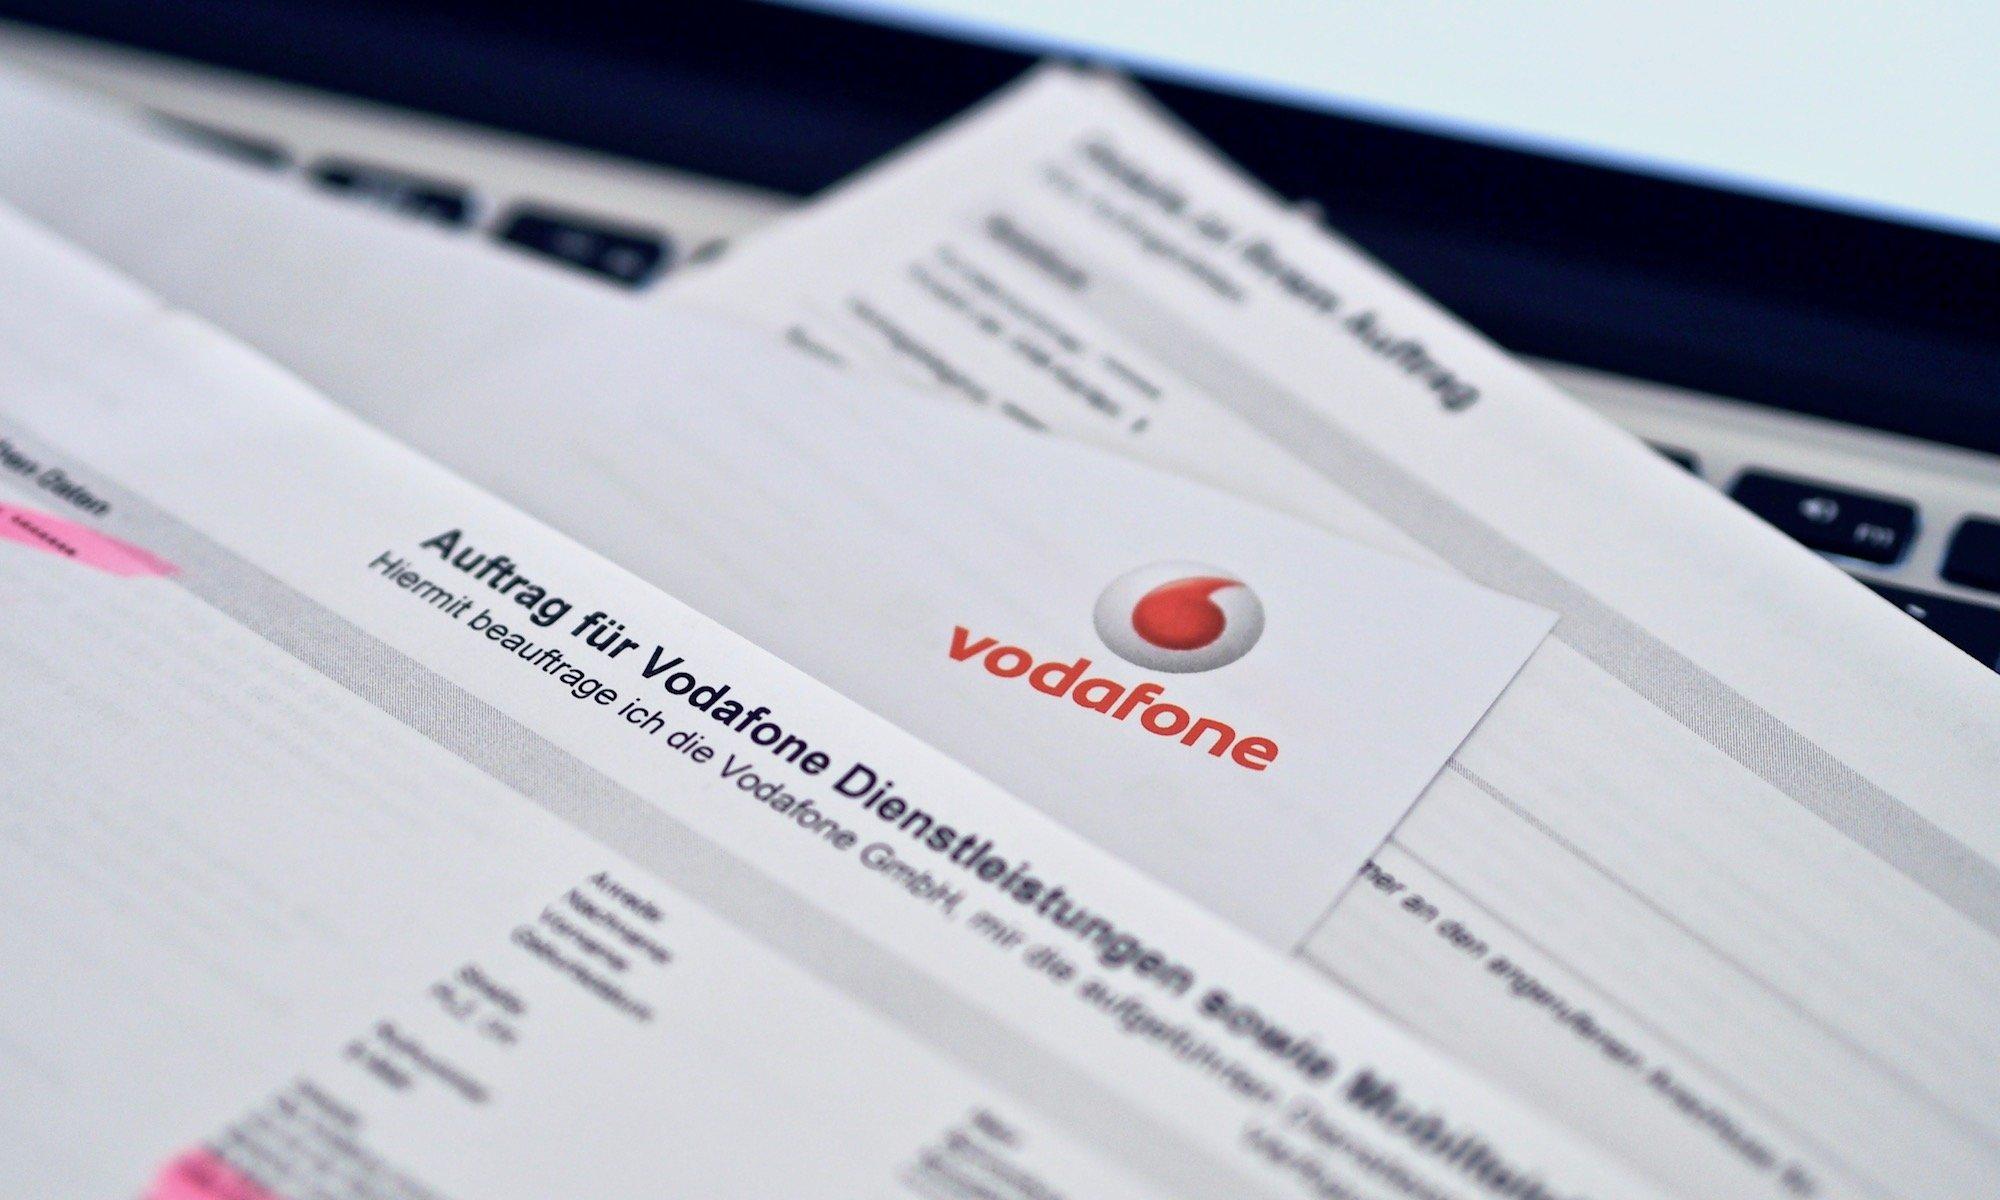 Vertragsunterlagen an der Haustür - Ein Vodafone-Erlebnis | Foto: konsensor.de